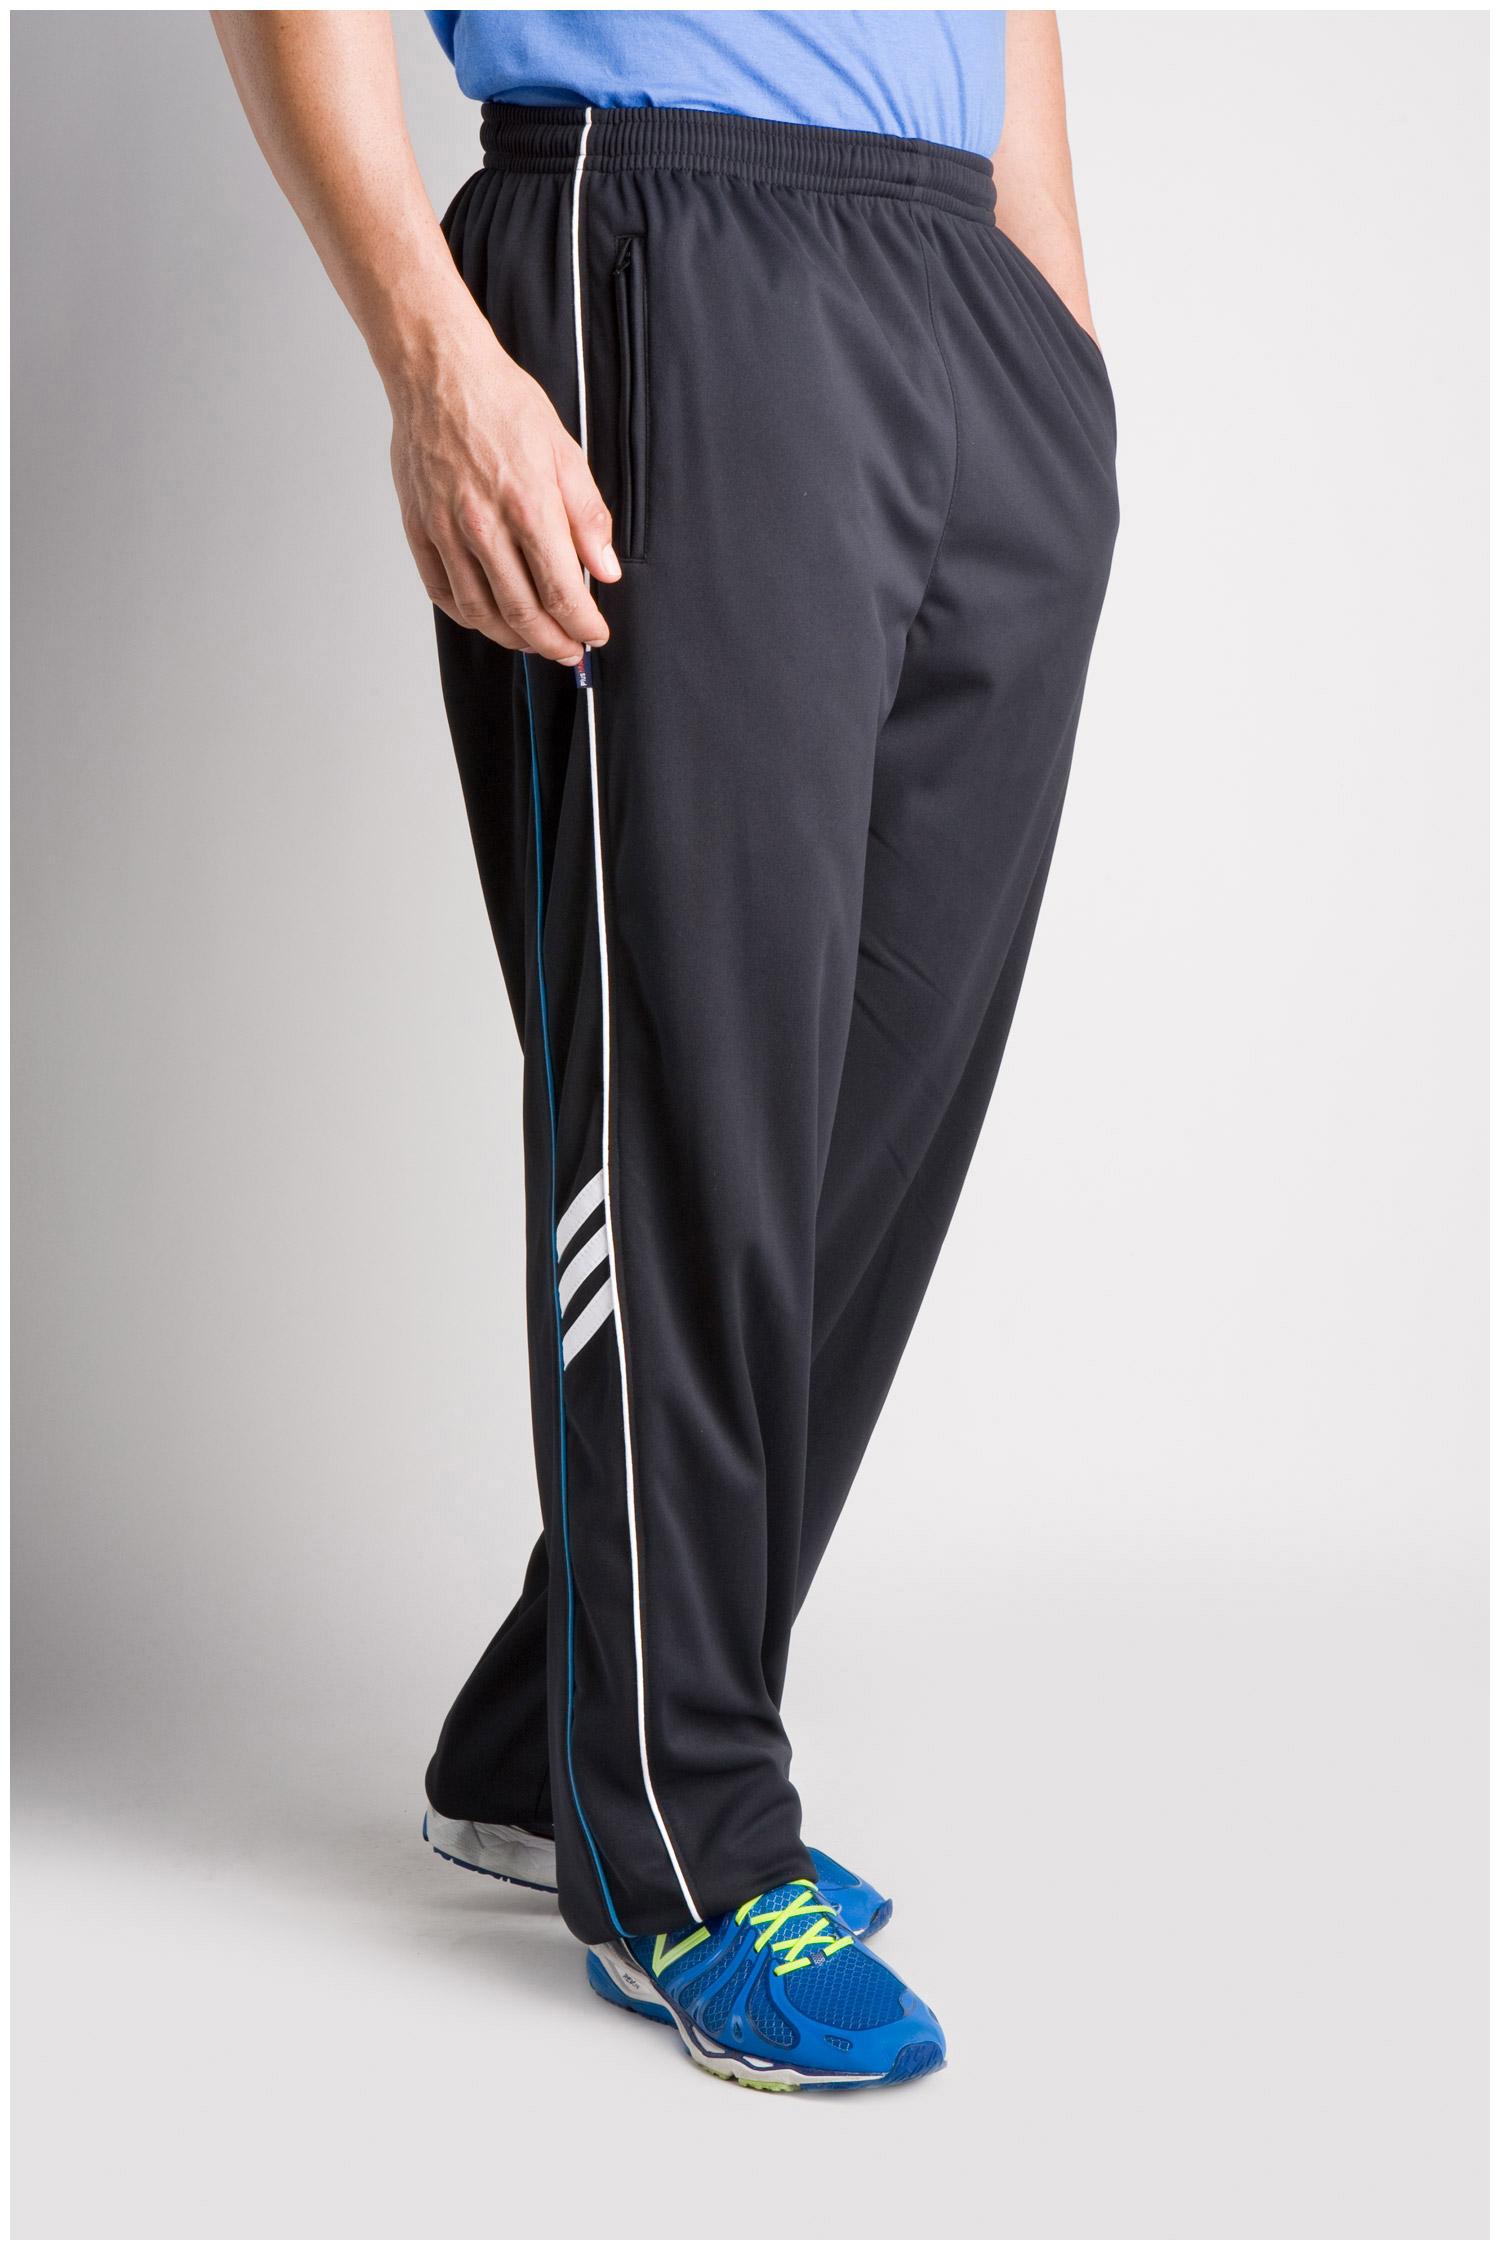 52ae56190cd17 Pantalones de Chandal Tallas Grandes Hombre - Ref. 104779